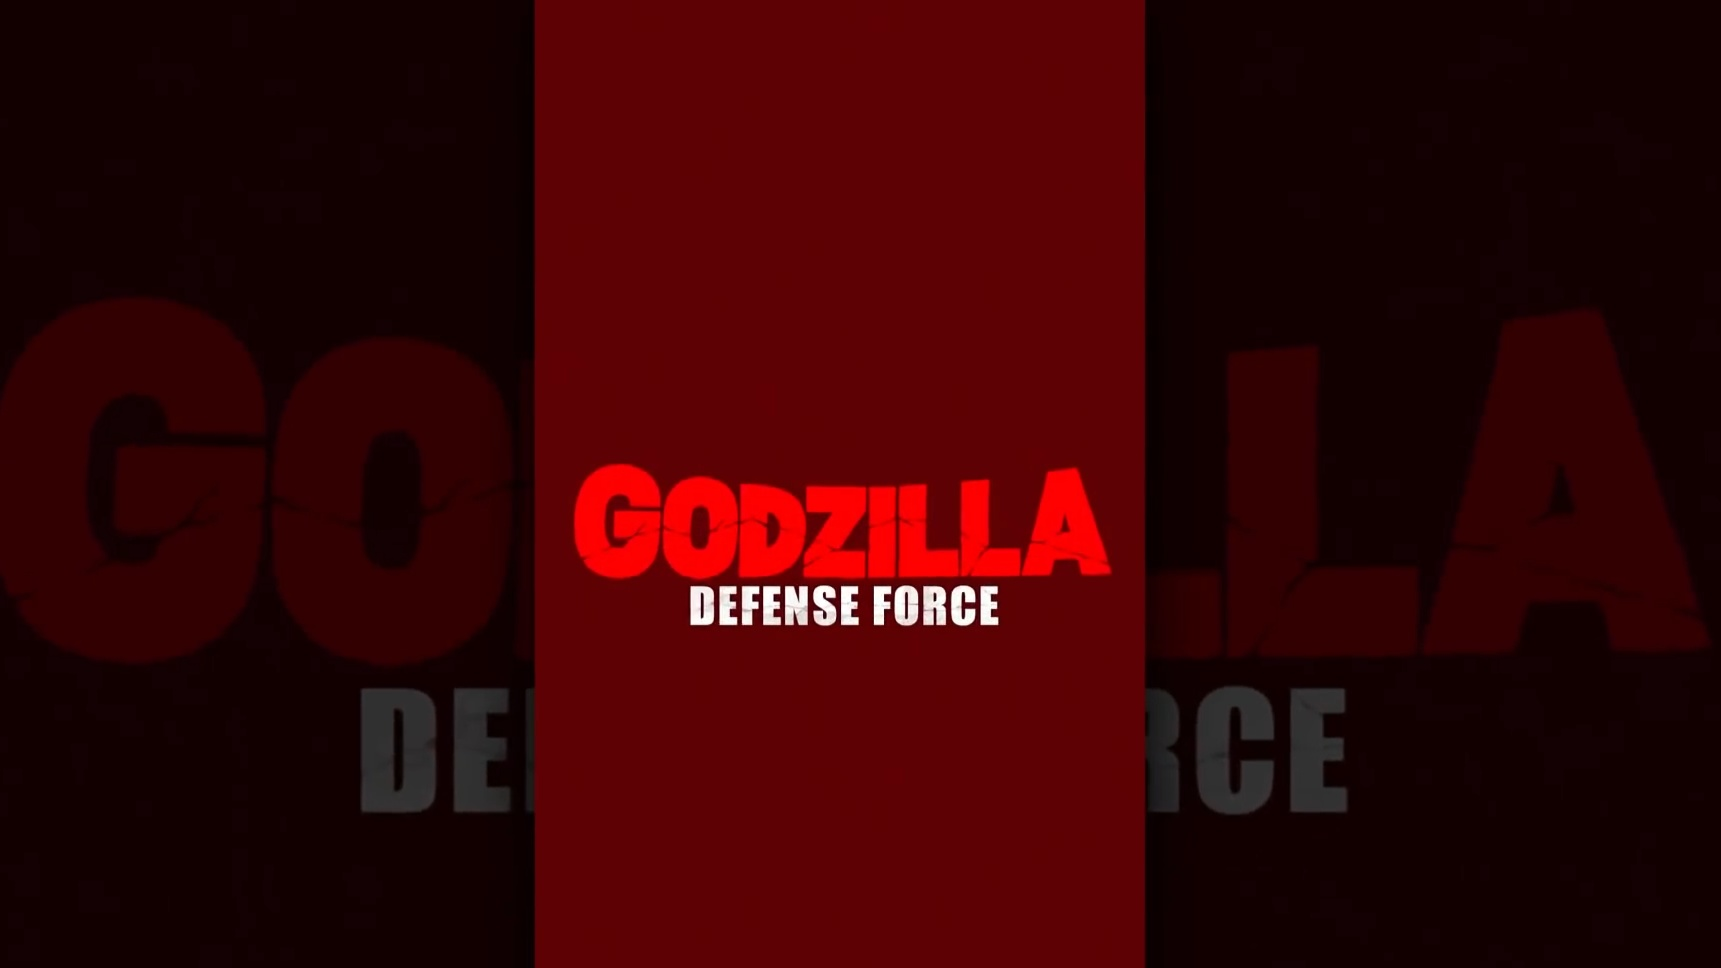 Godzilla Defense Force MOD APK